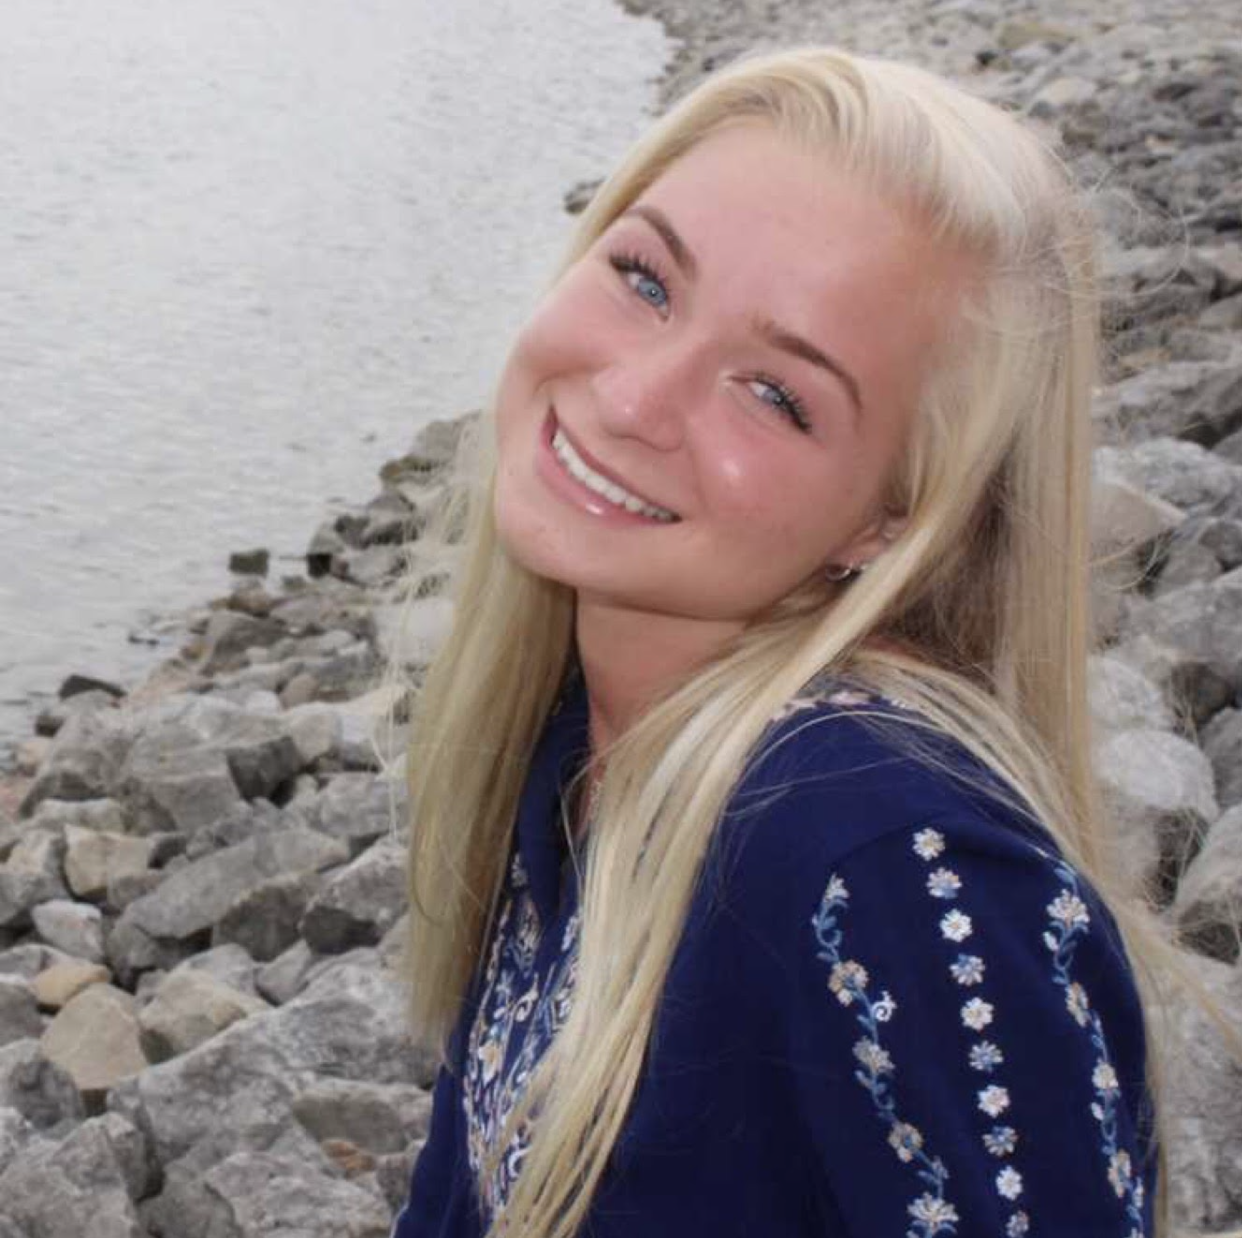 Faith Austin, varsity women's lacrosse player and sophomore